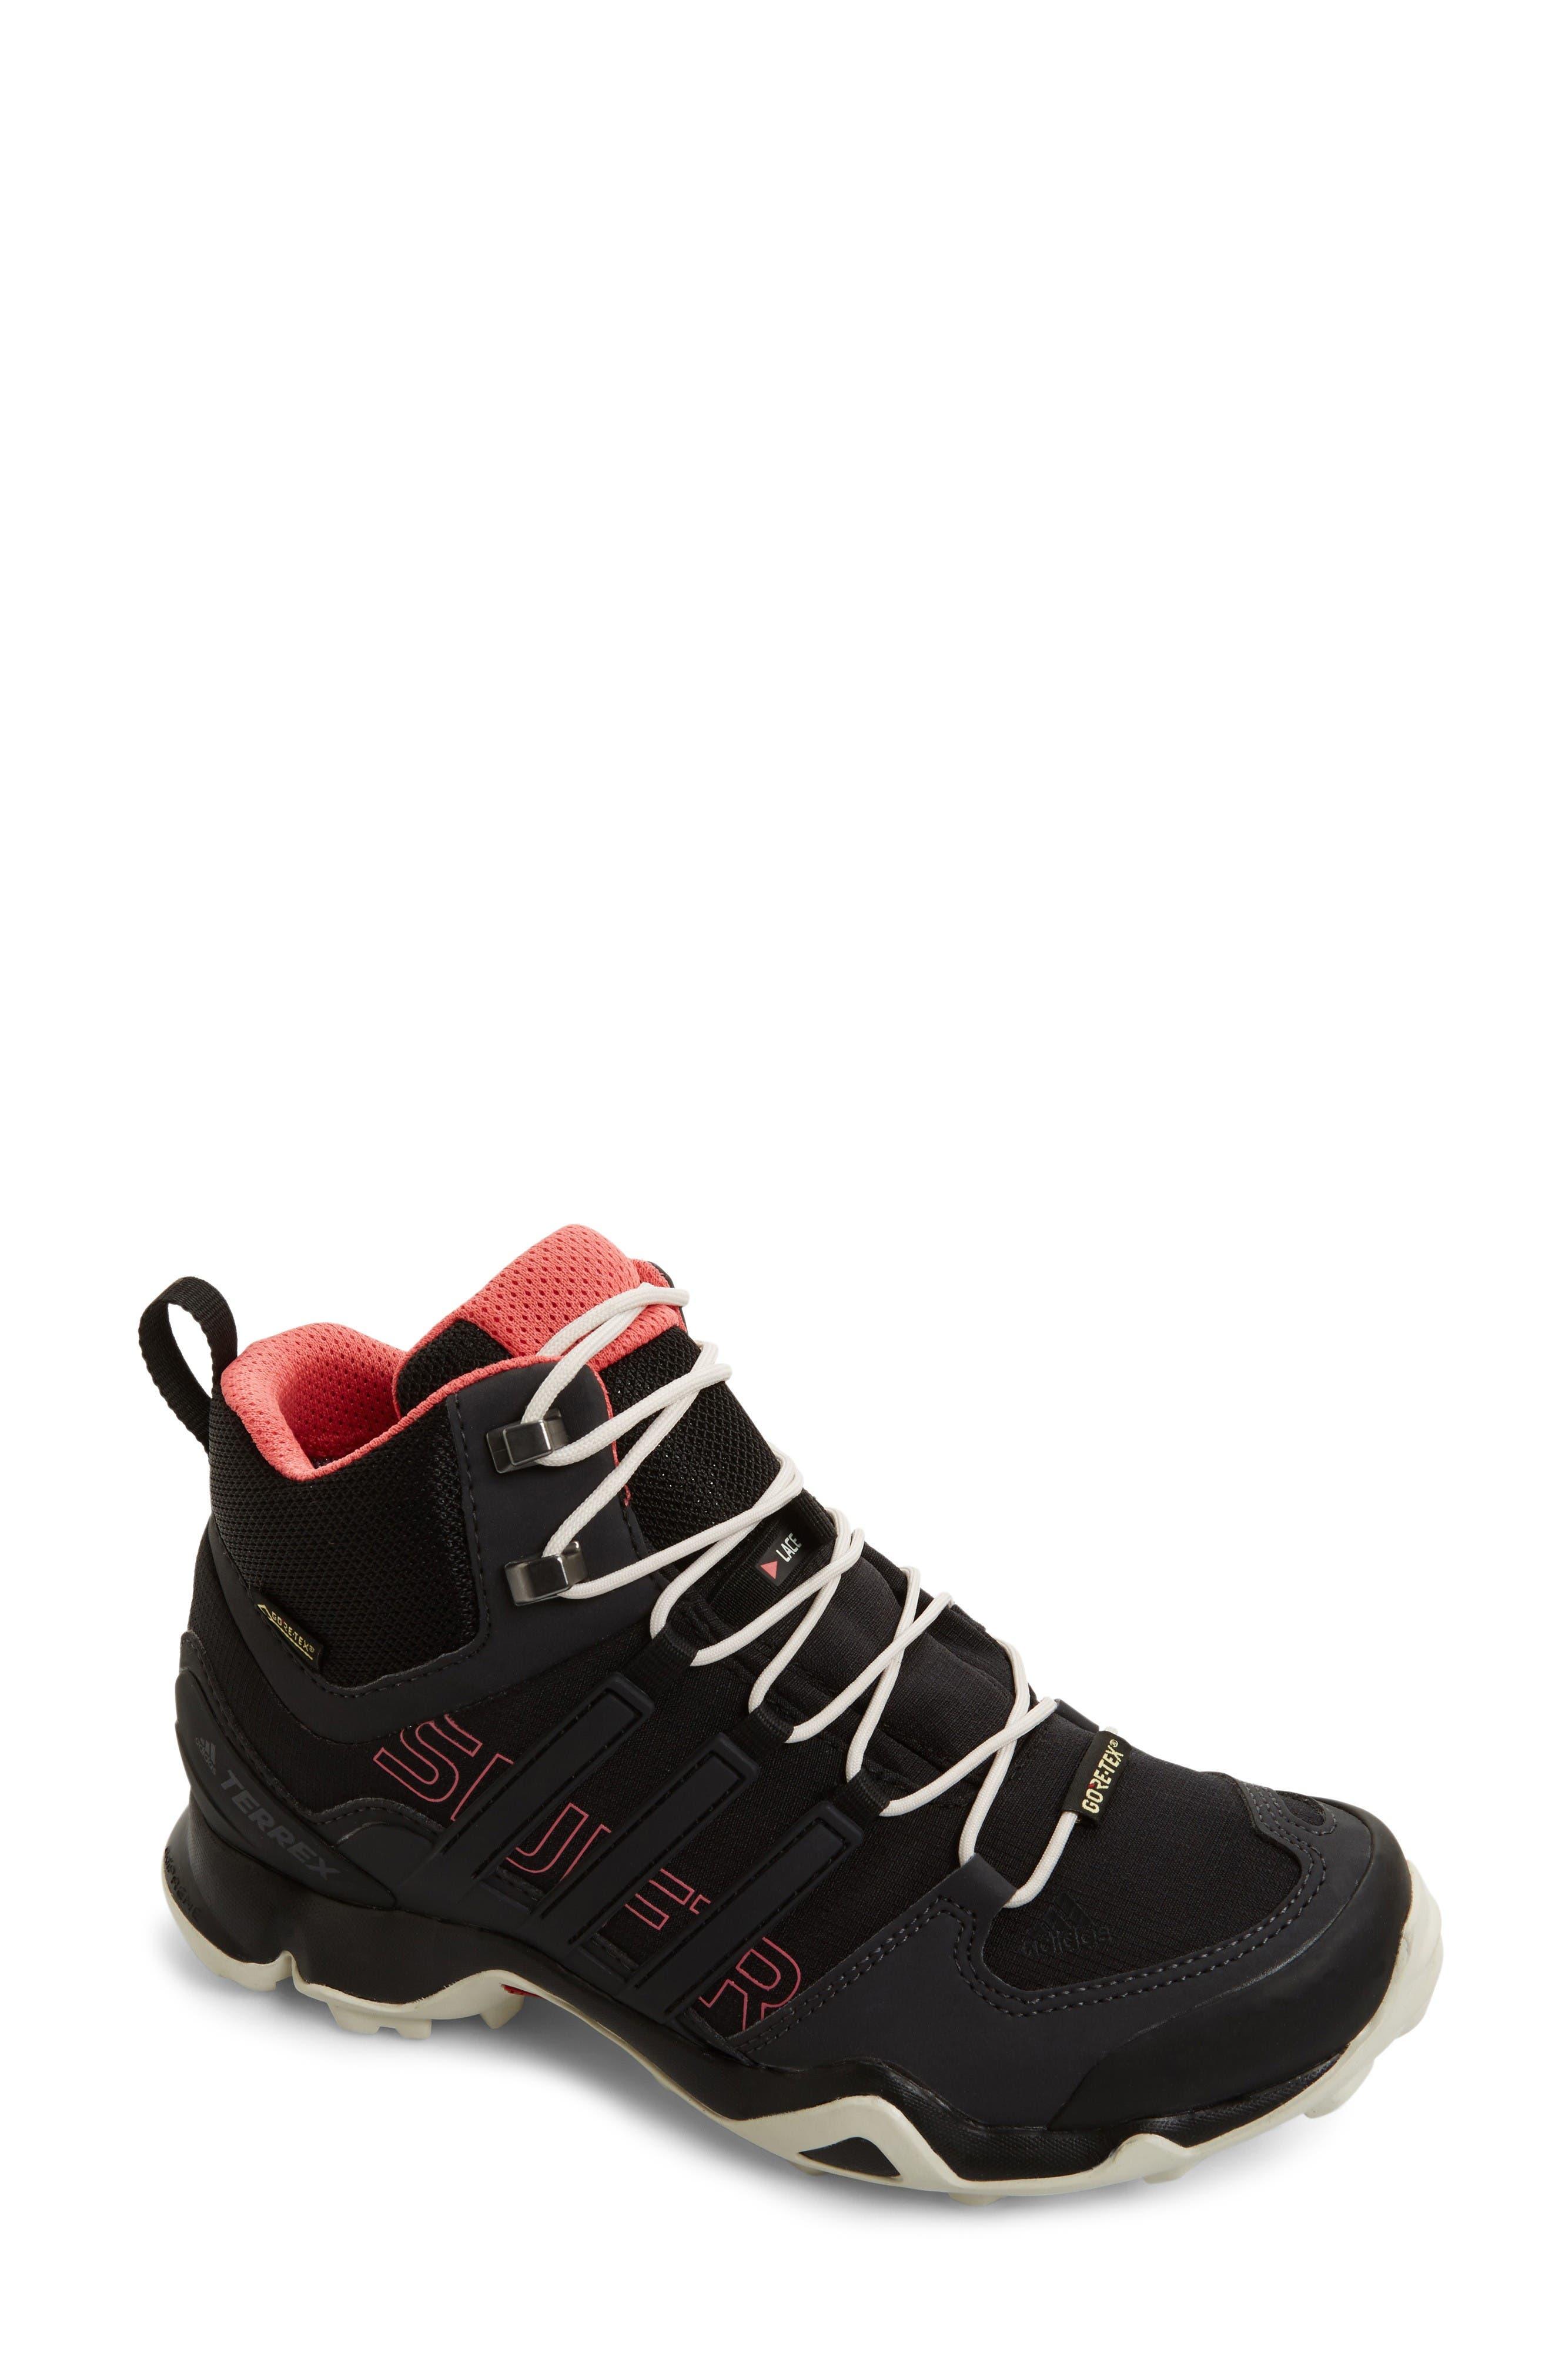 Alternate Image 1 Selected - adidas Terrex Swift R GTX Mid Hiking Boot (Women)